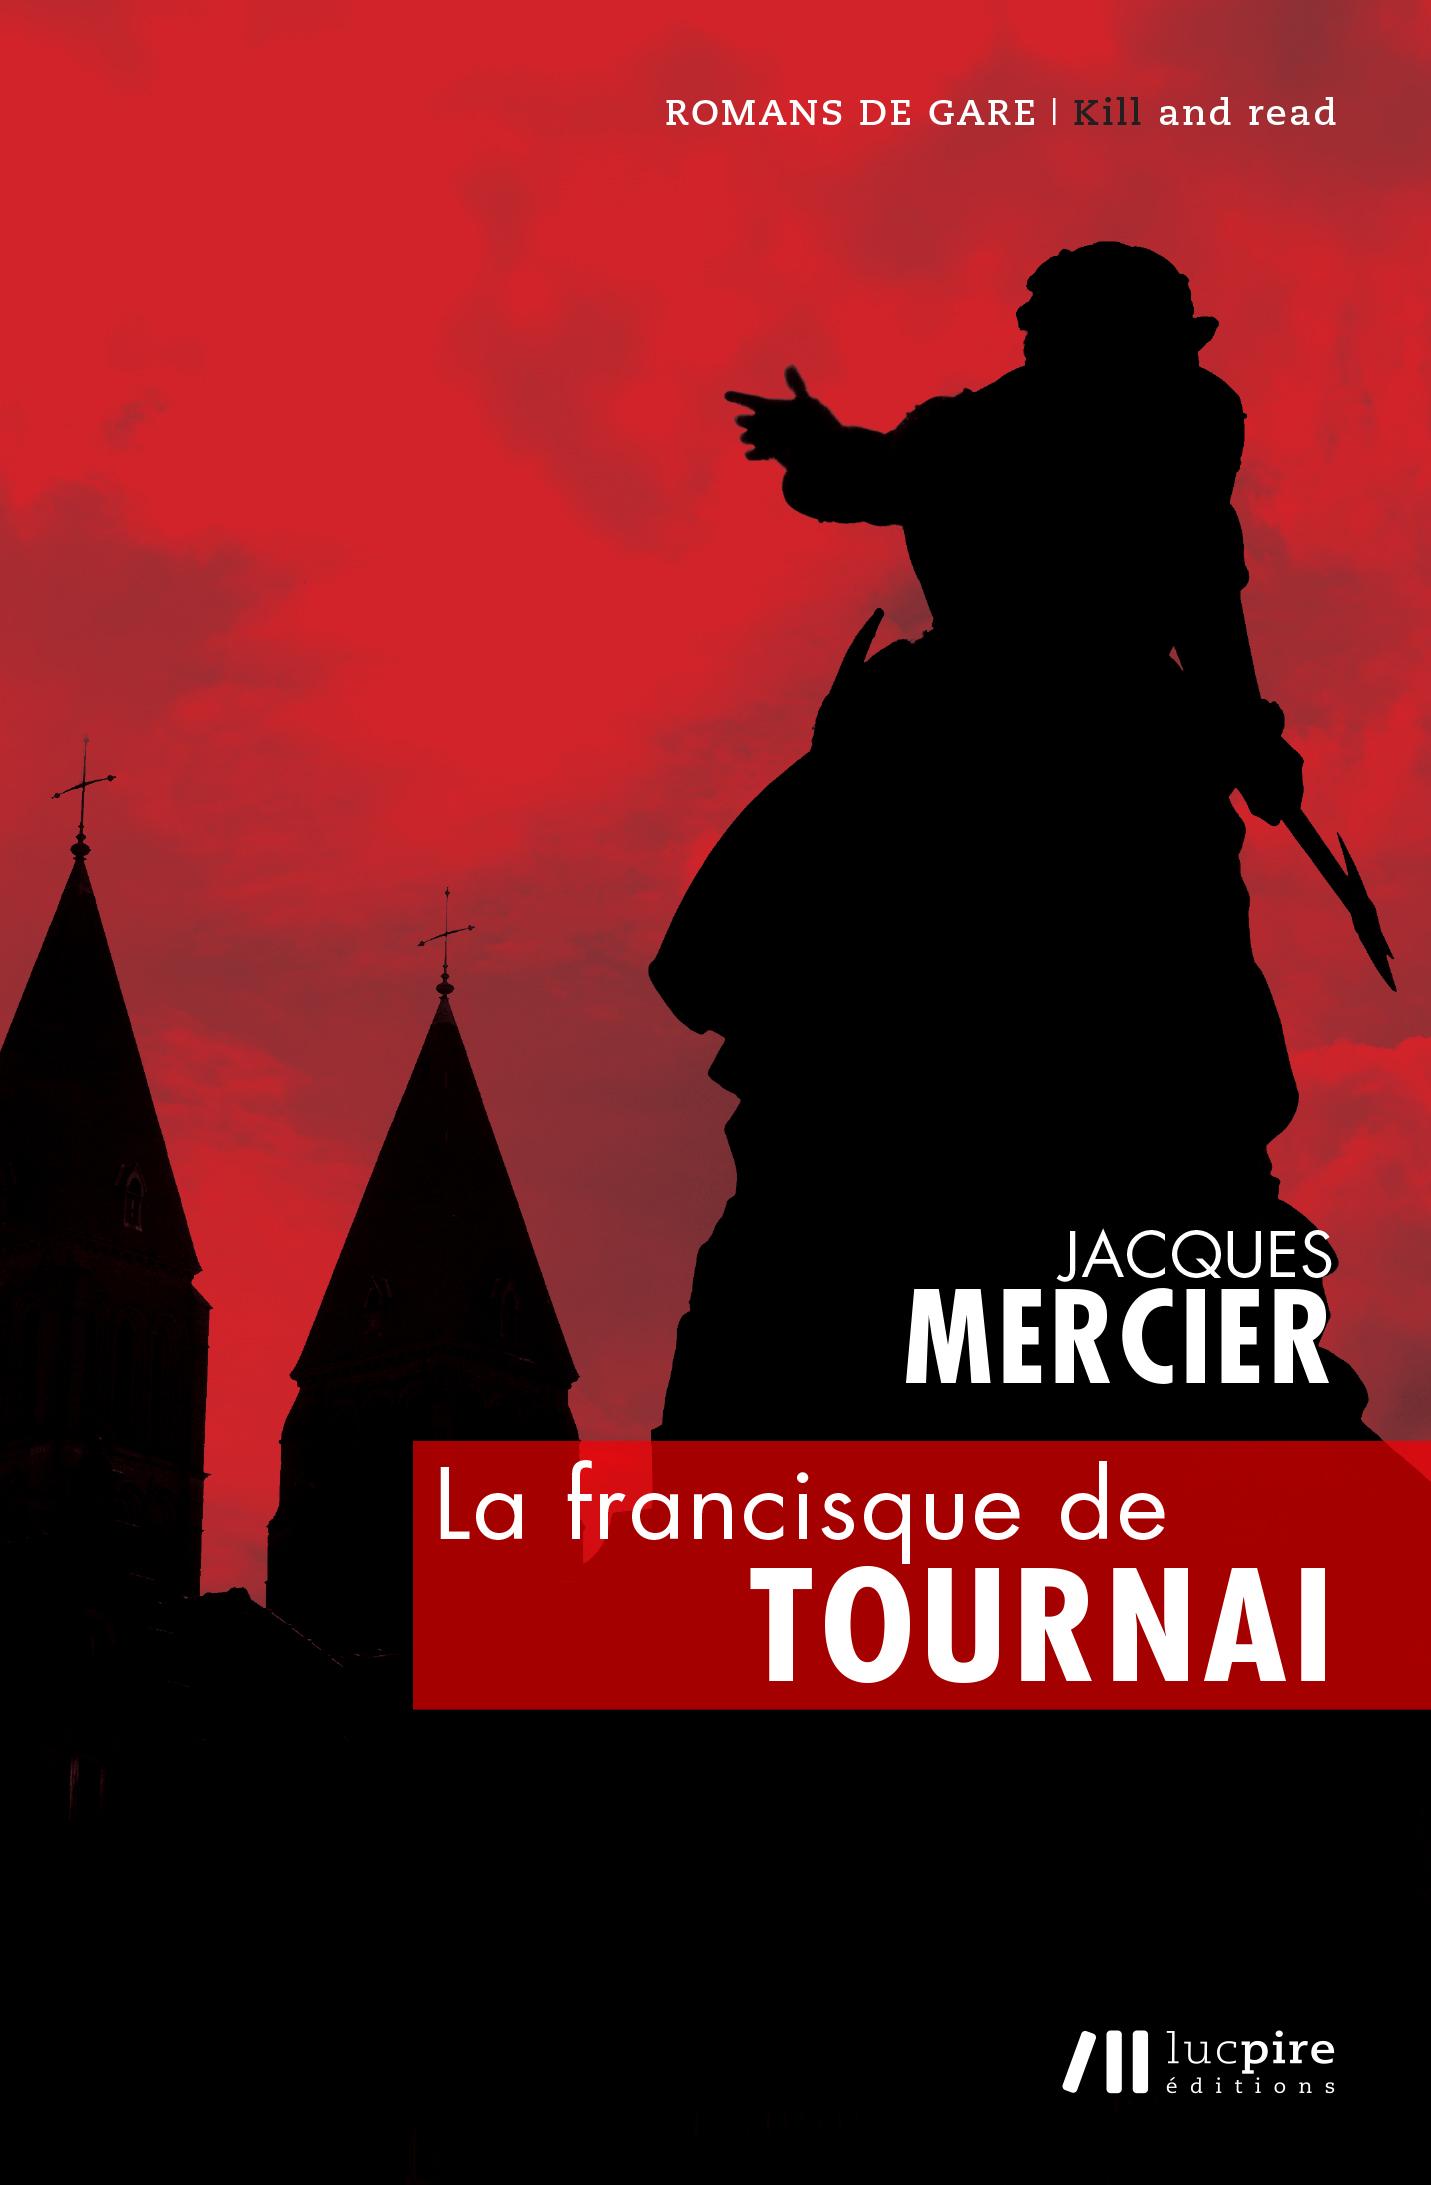 FrancisqueTournai cover 2d